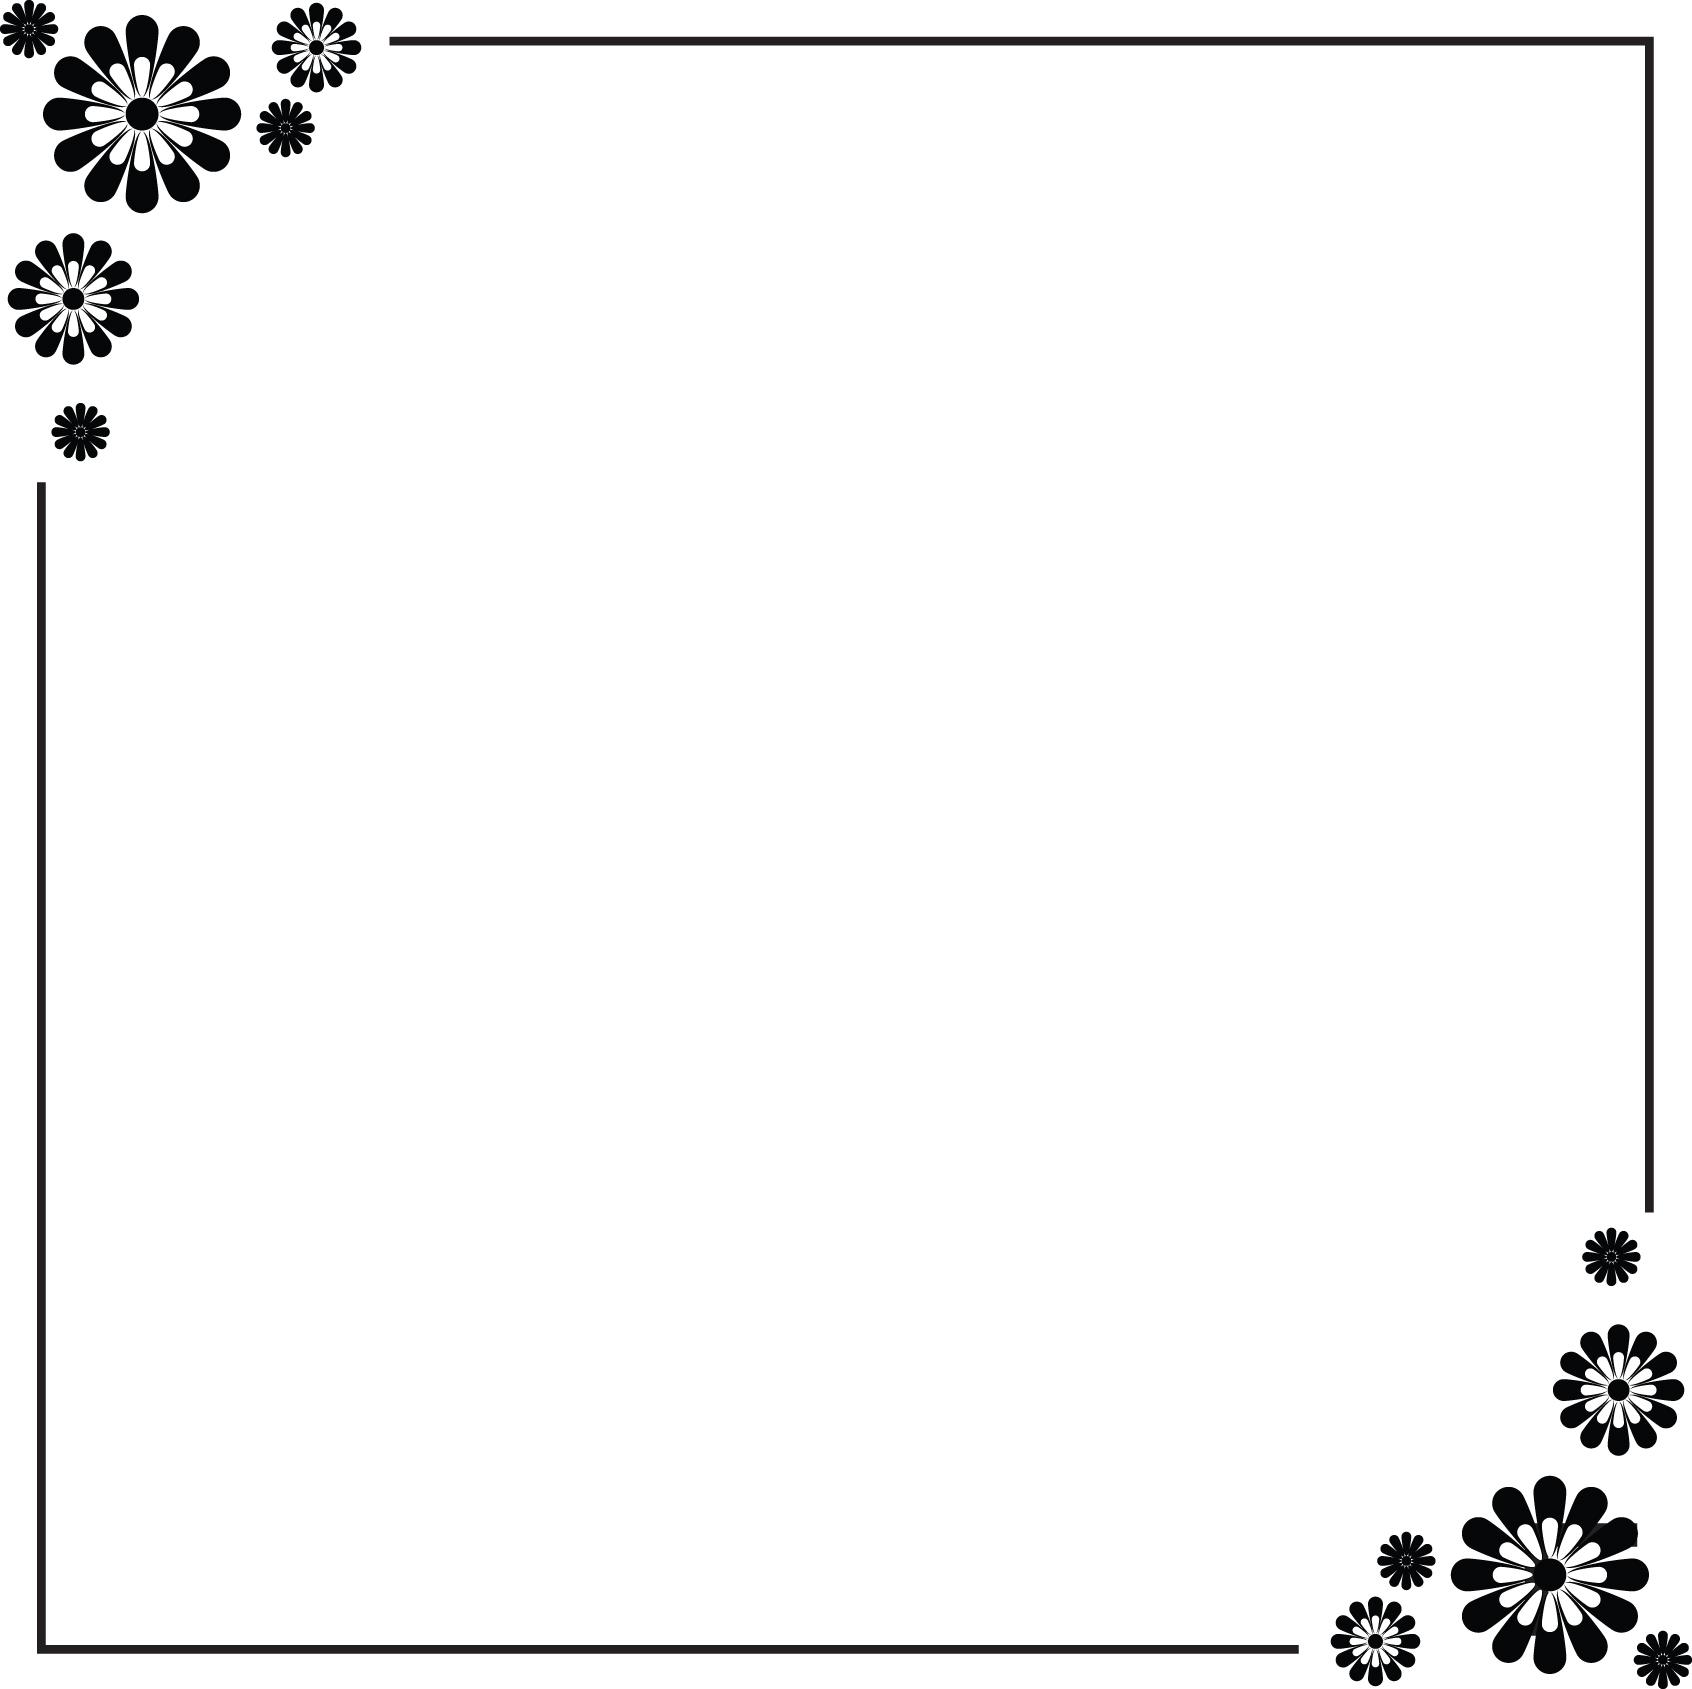 14 Paper Border Designs Images